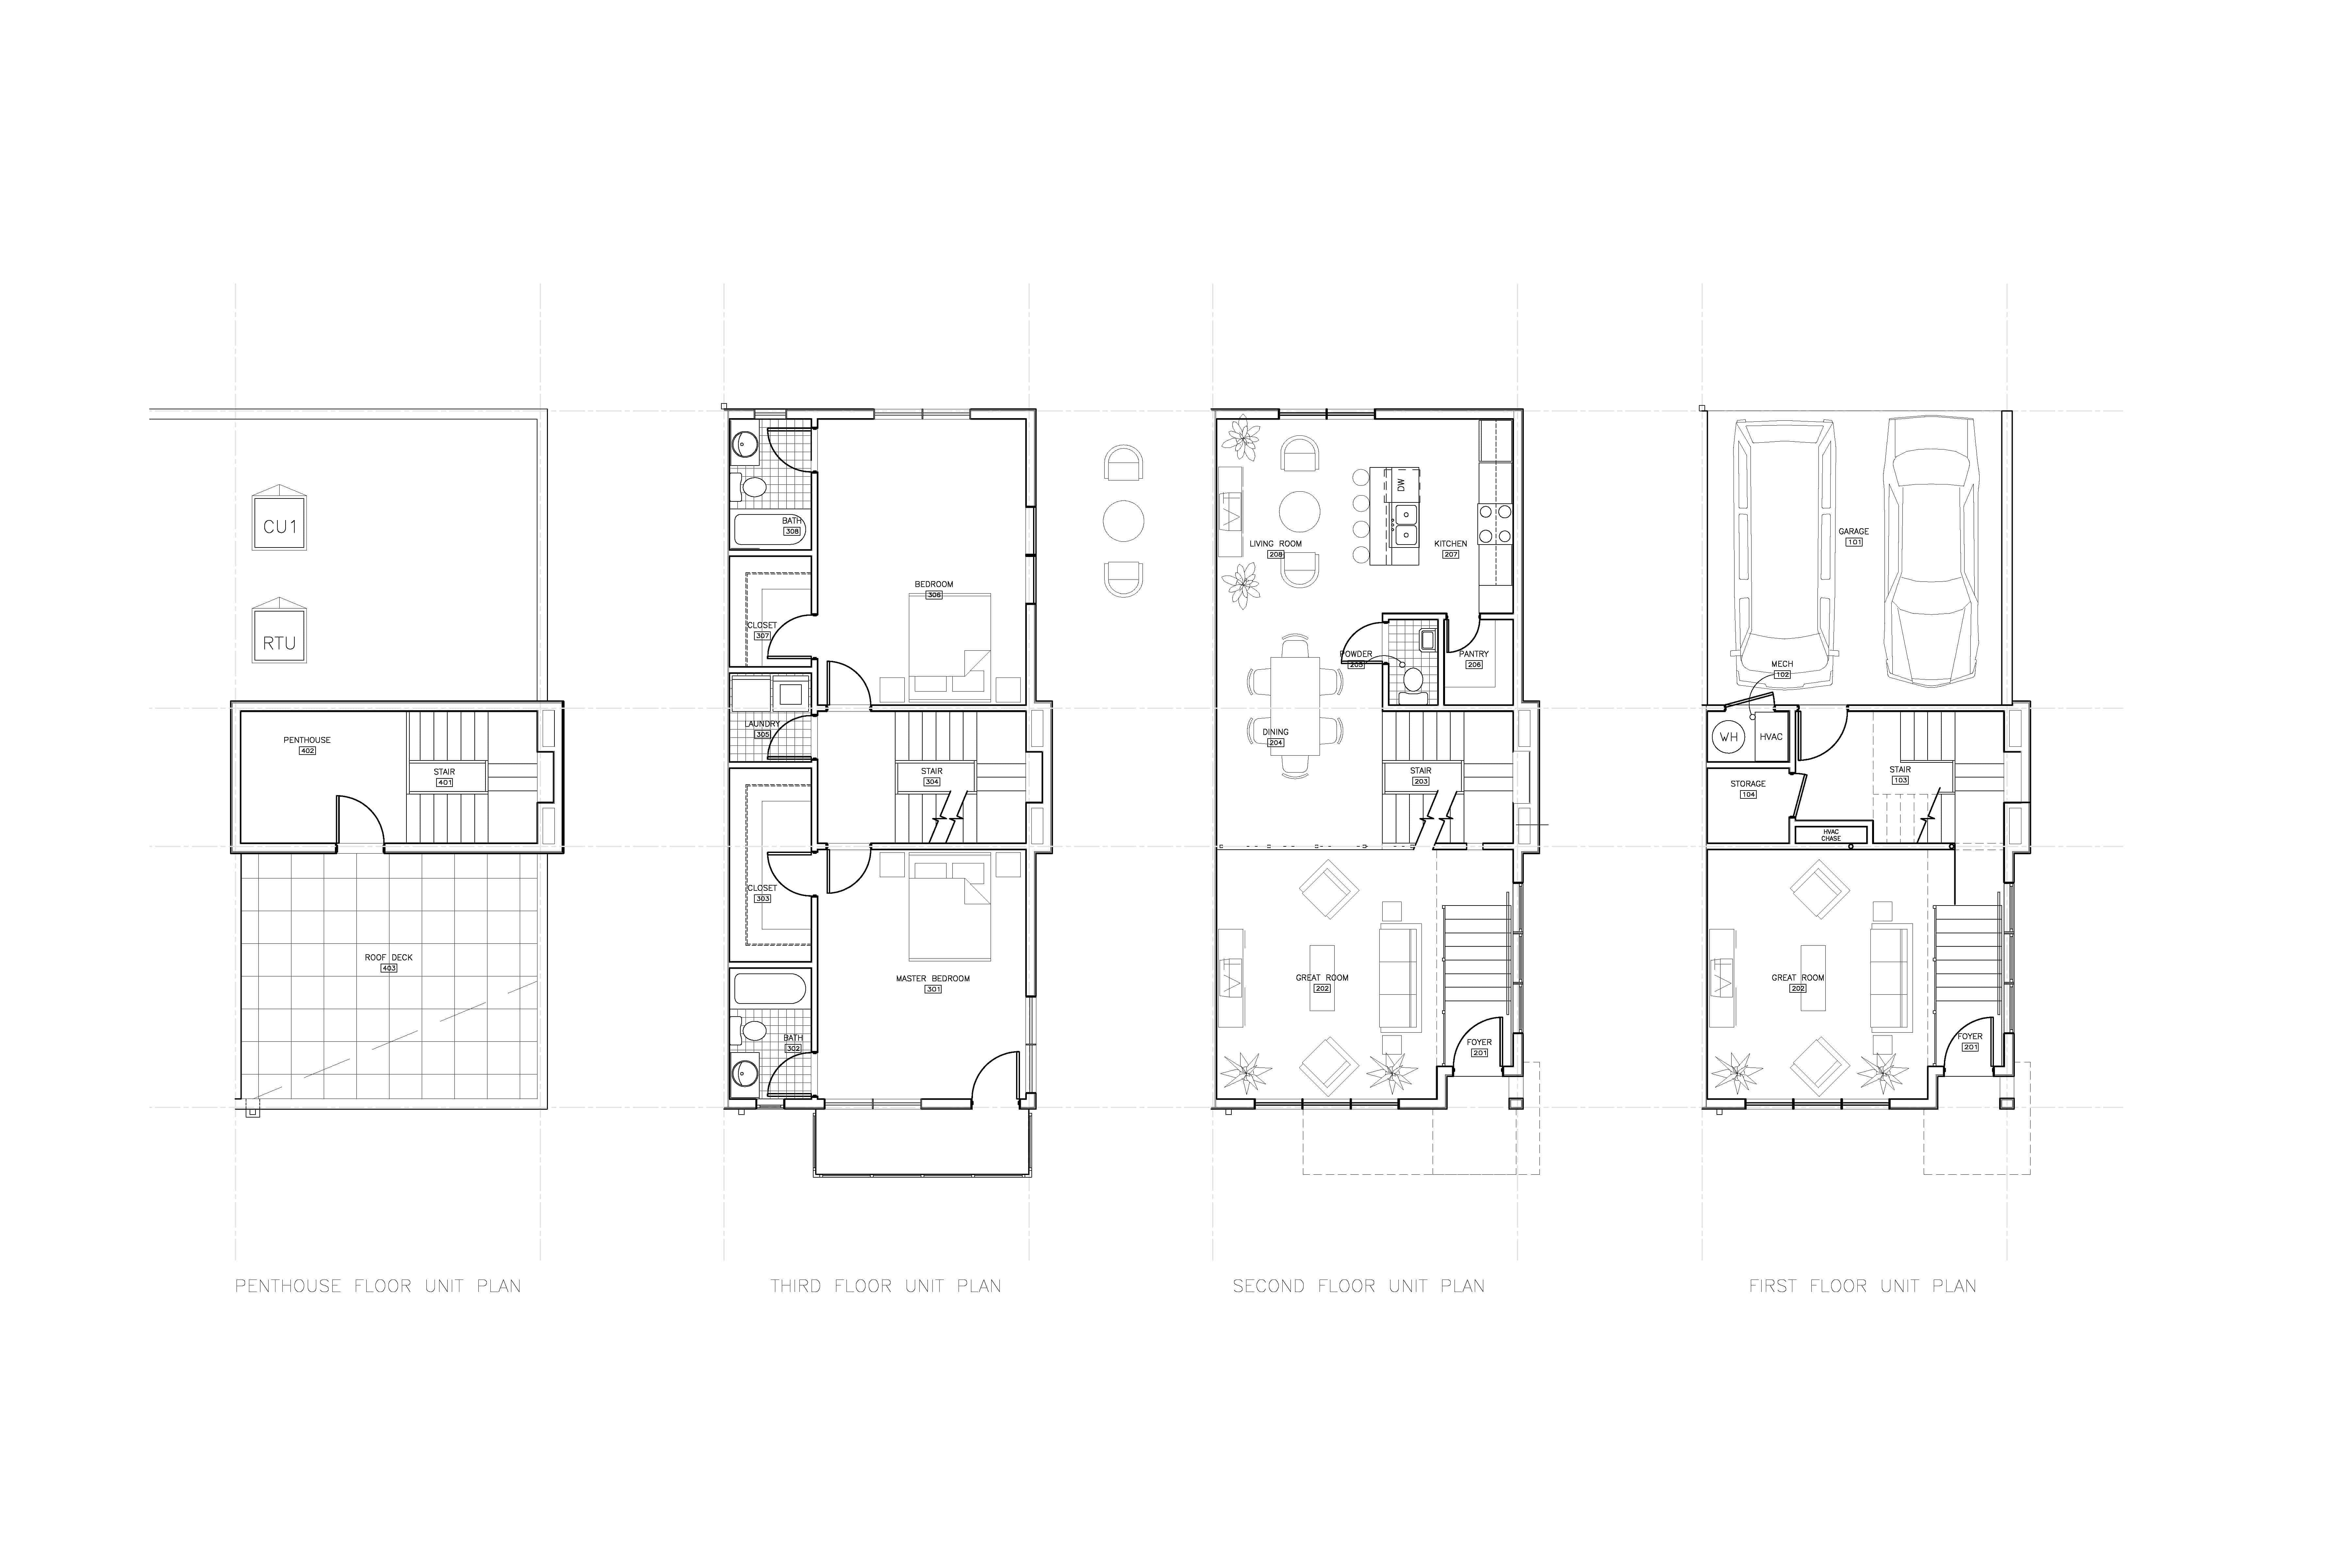 06-006-A11-Plans-A-1_Edited